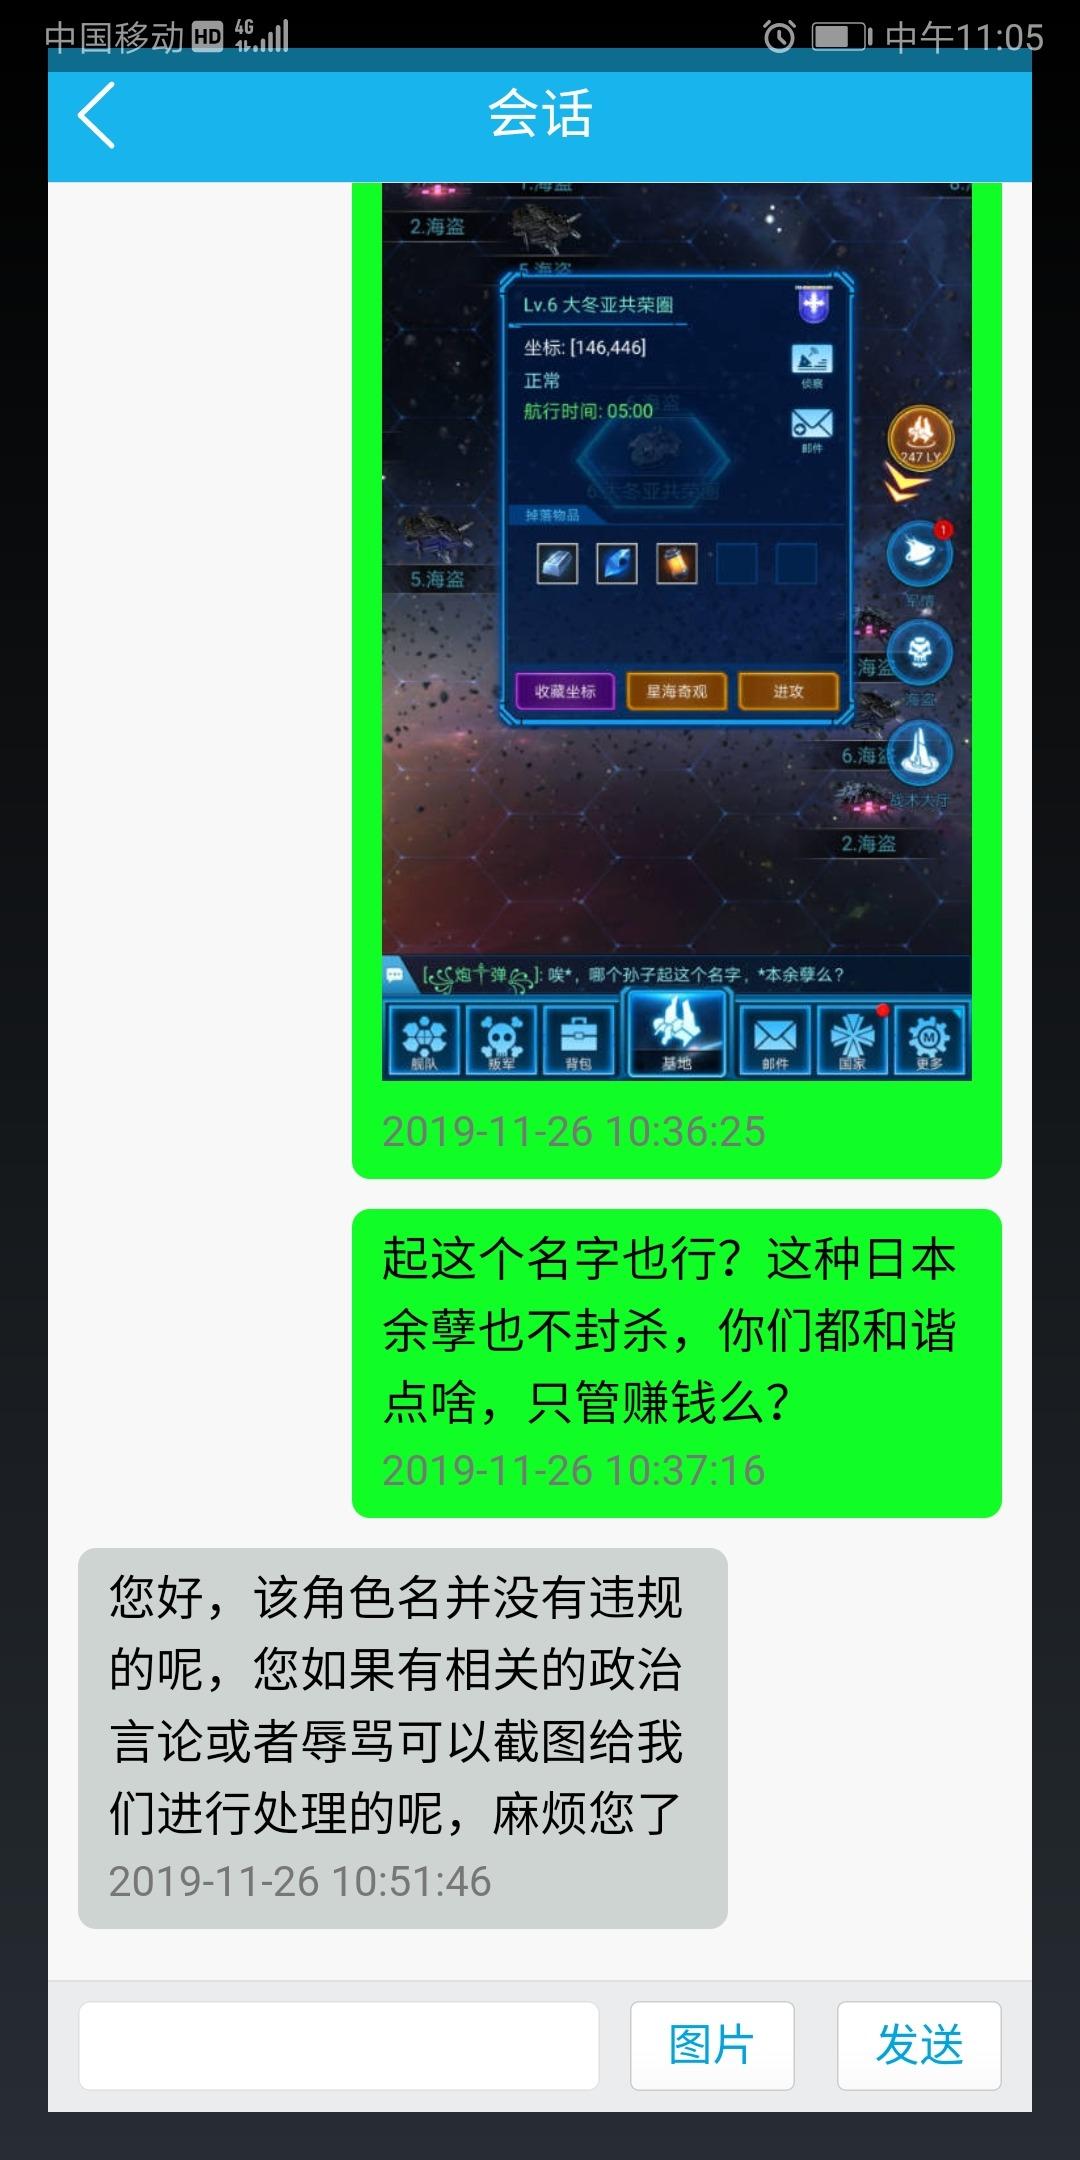 Screenshot_20191130_110507_com.jedigames.p16s.huawei.jpg